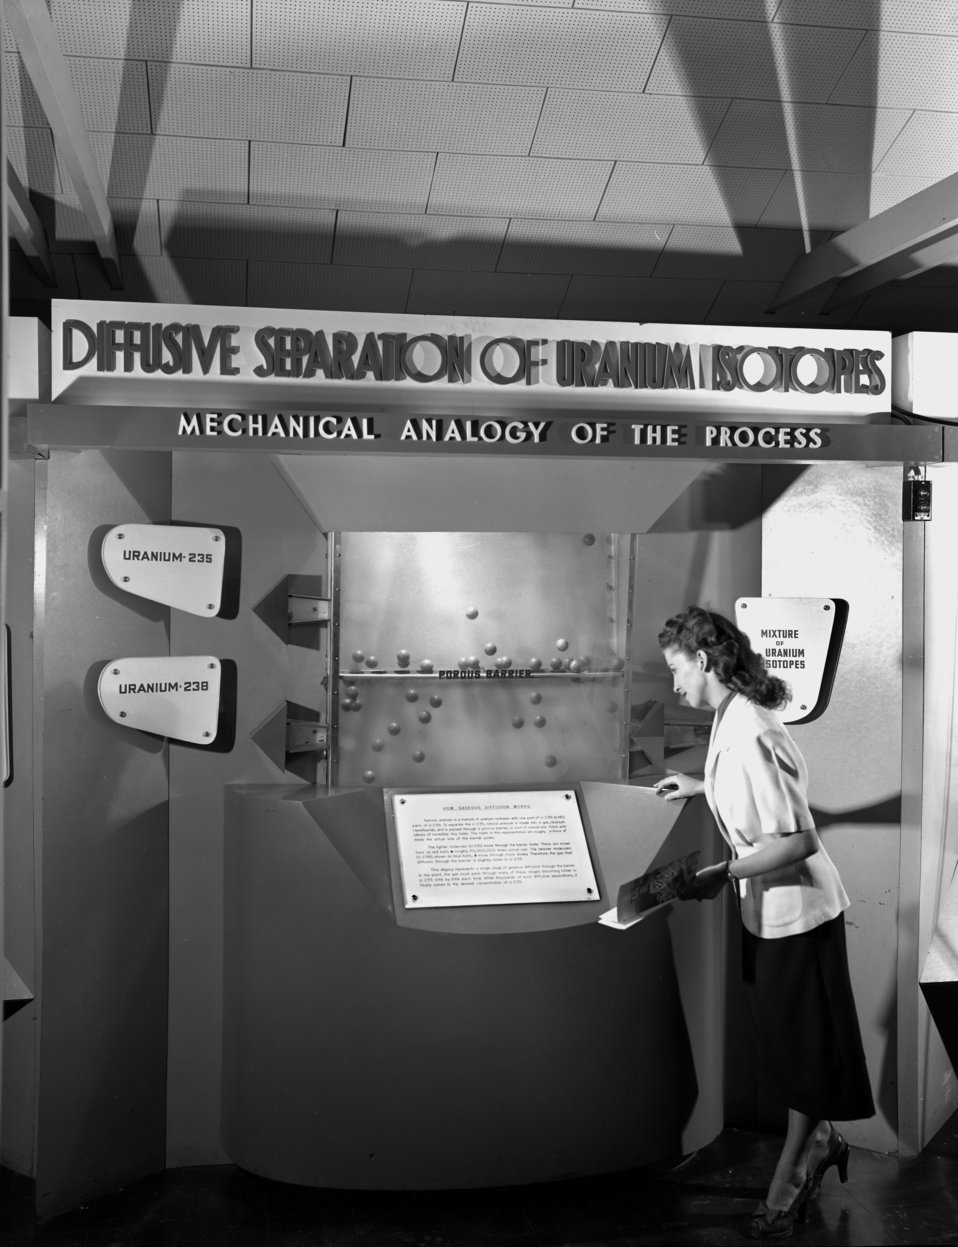 Radiosotope Display AMSE Oak Ridge 1949